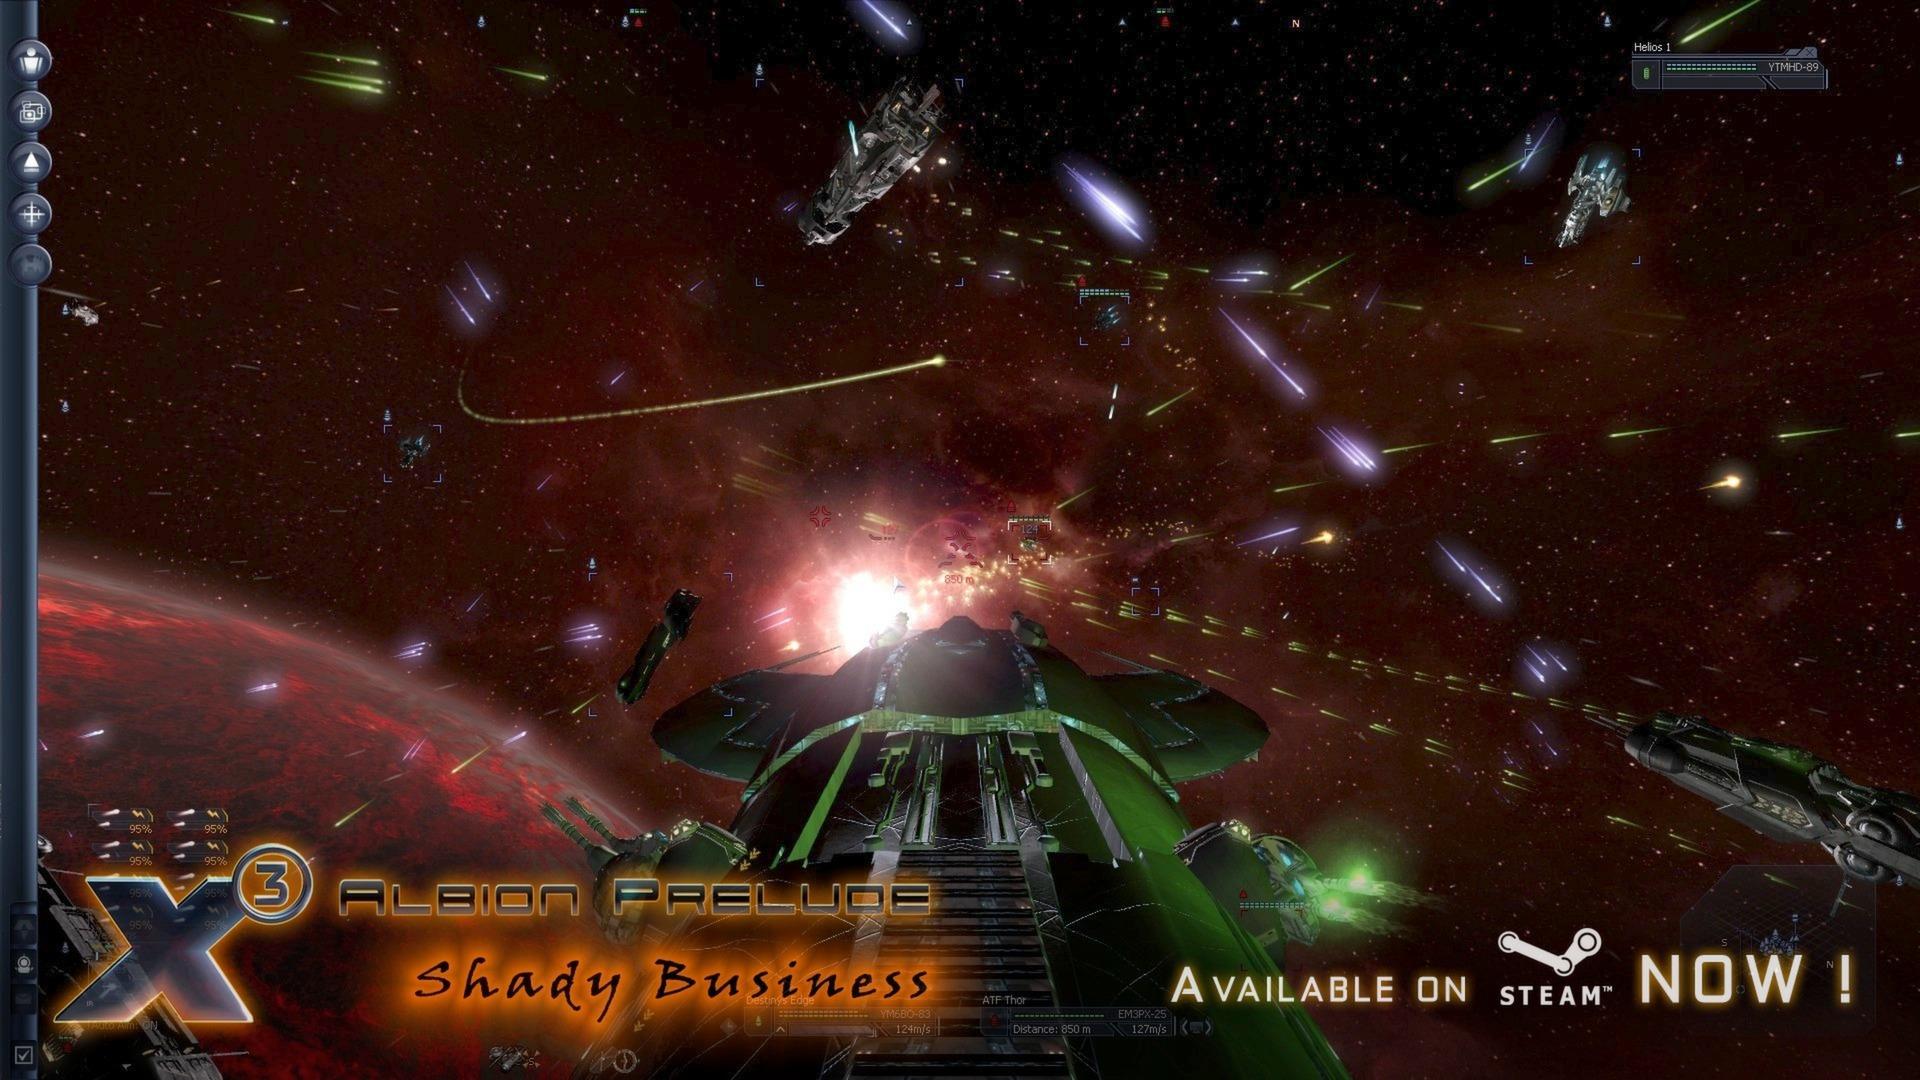 X3: Albion Prelude Screenshot 2